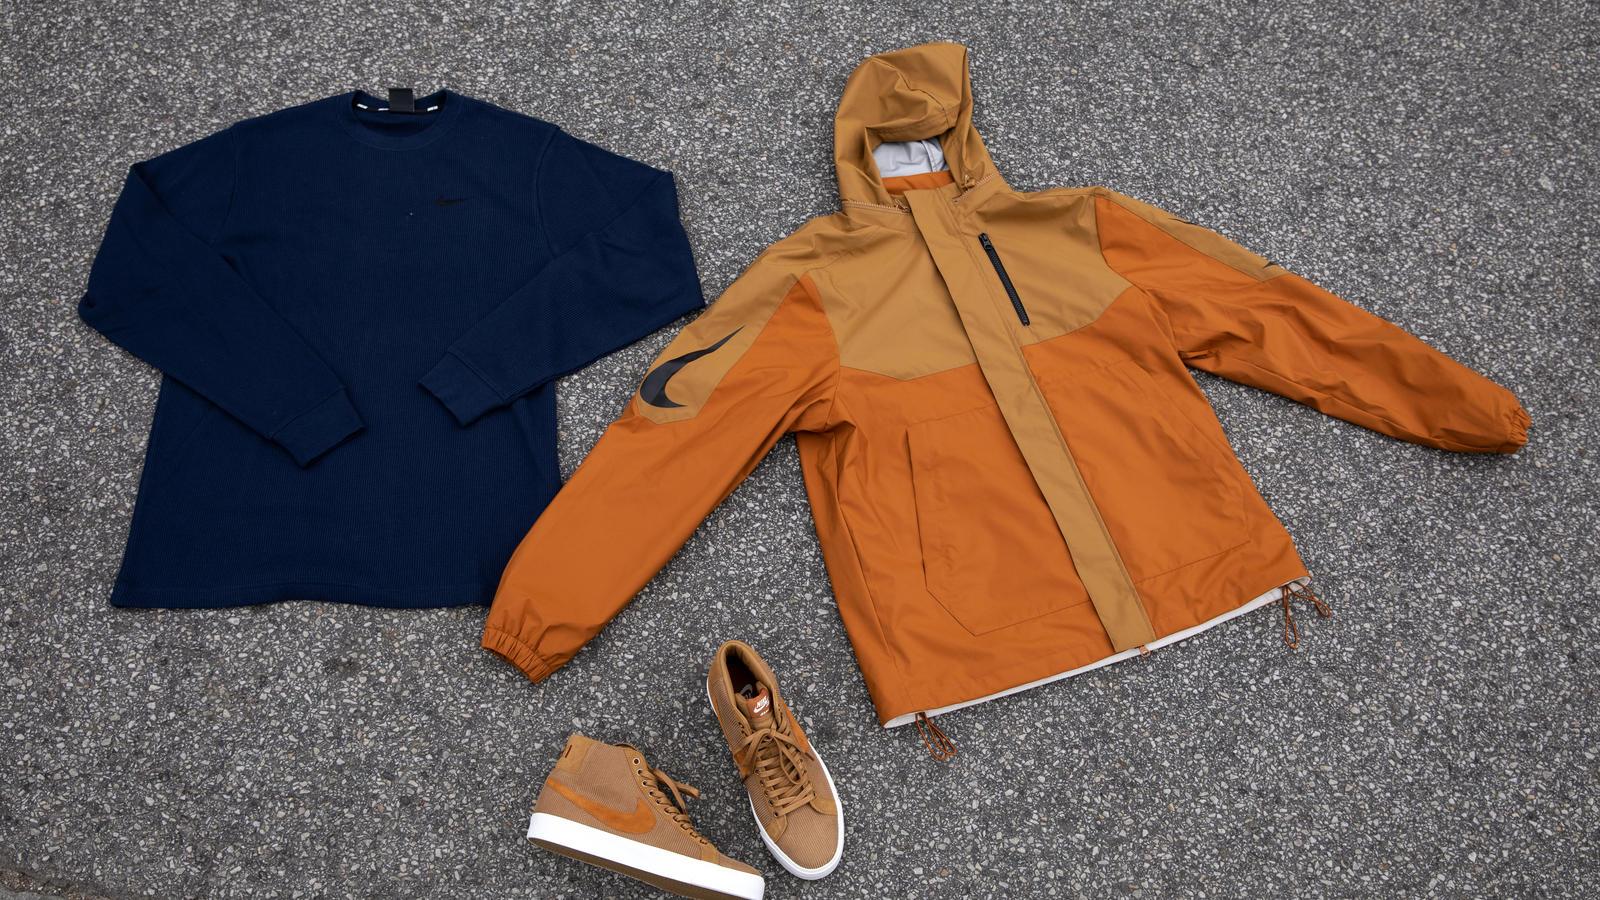 Nike SB Oski Orange Label Collection SB Blazer SB Dunk Apparel 3